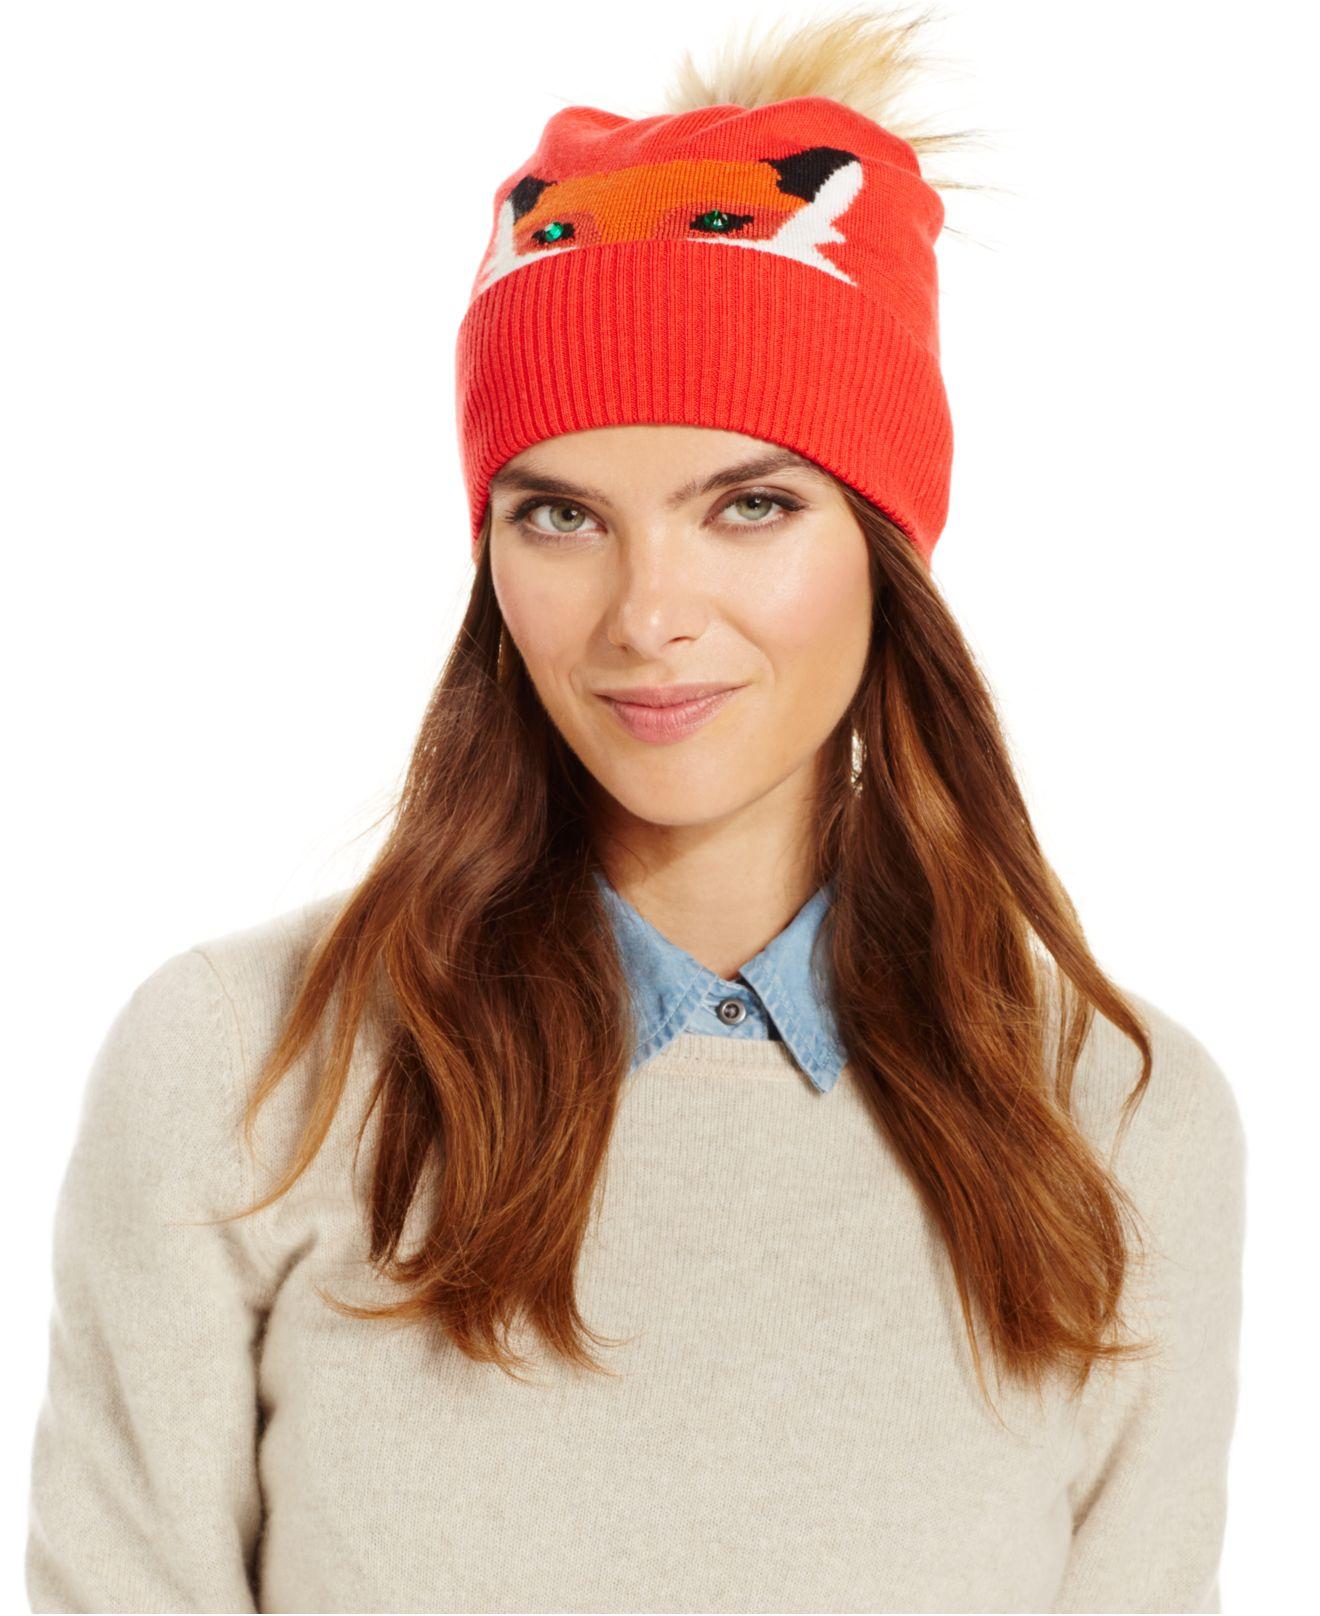 bacd9a52e364e Kate Spade Crazy Like A Fox Beanie in Red - Lyst